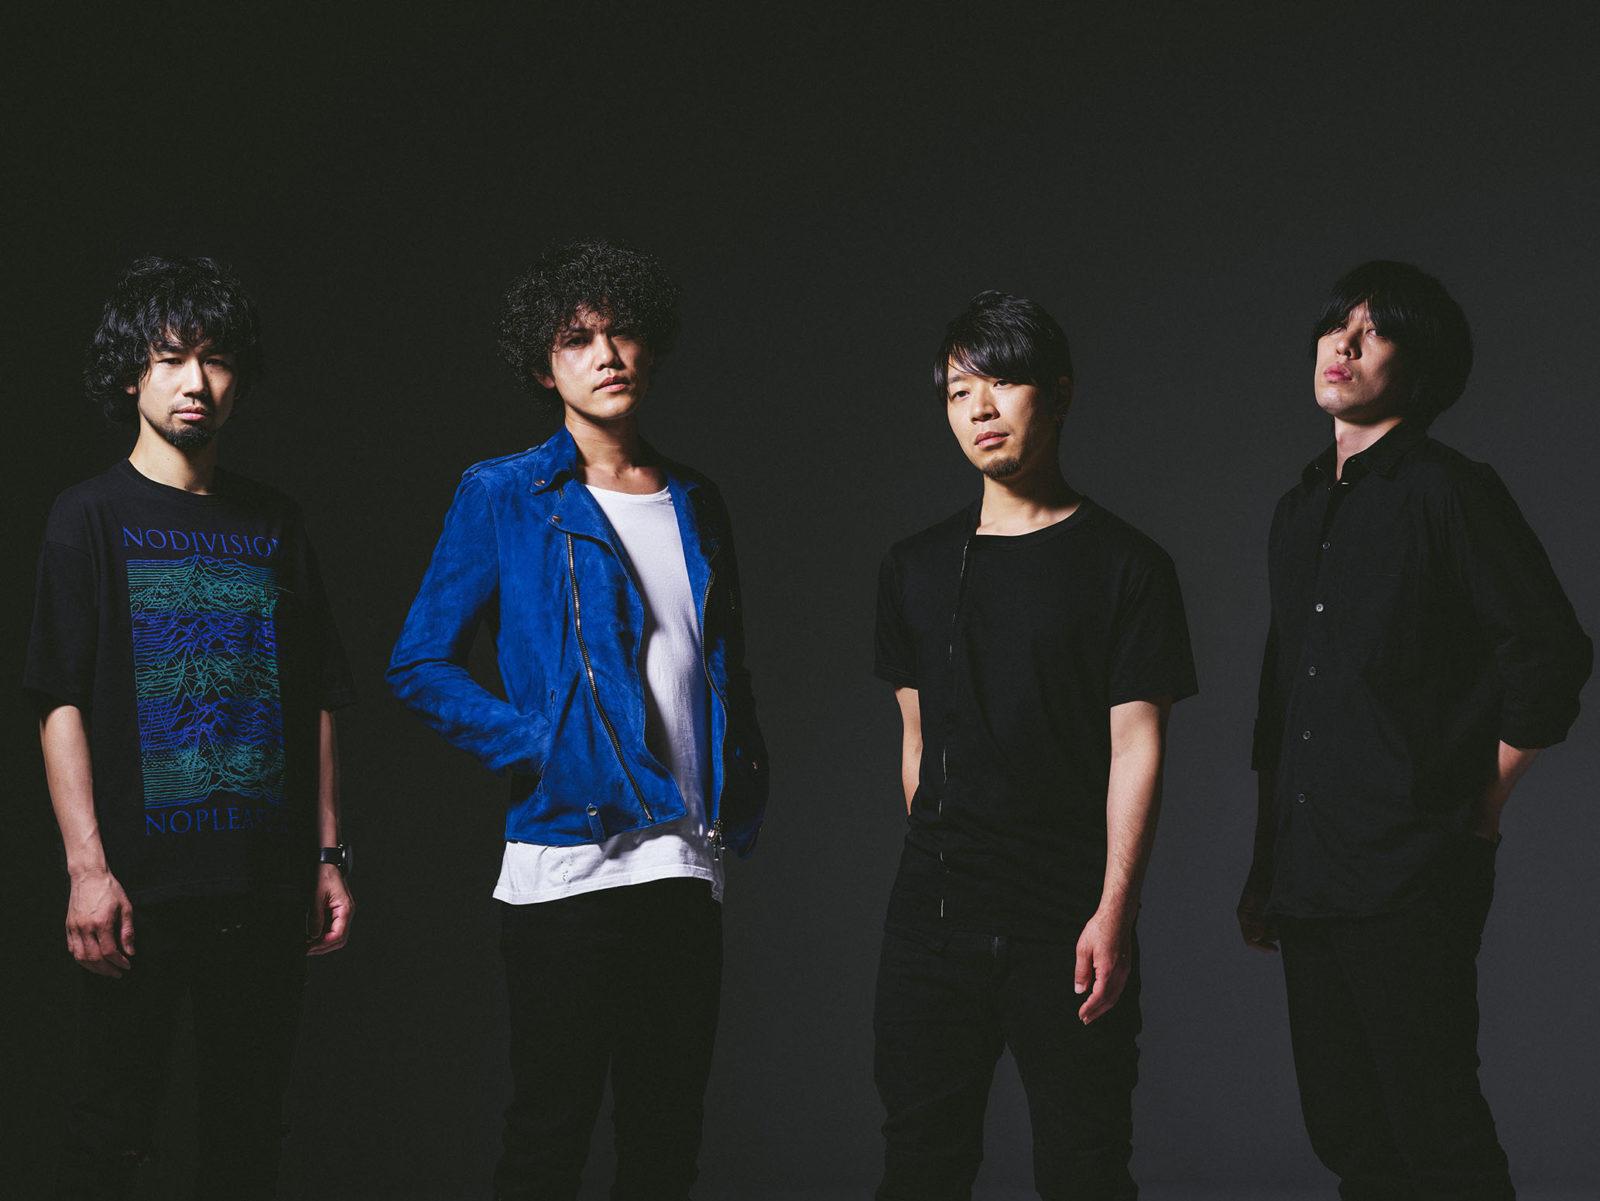 9mm Parabellum Bullet、8thアルバム「DEEP BLUE」先行全曲試聴会&トークイベントを開催サムネイル画像!